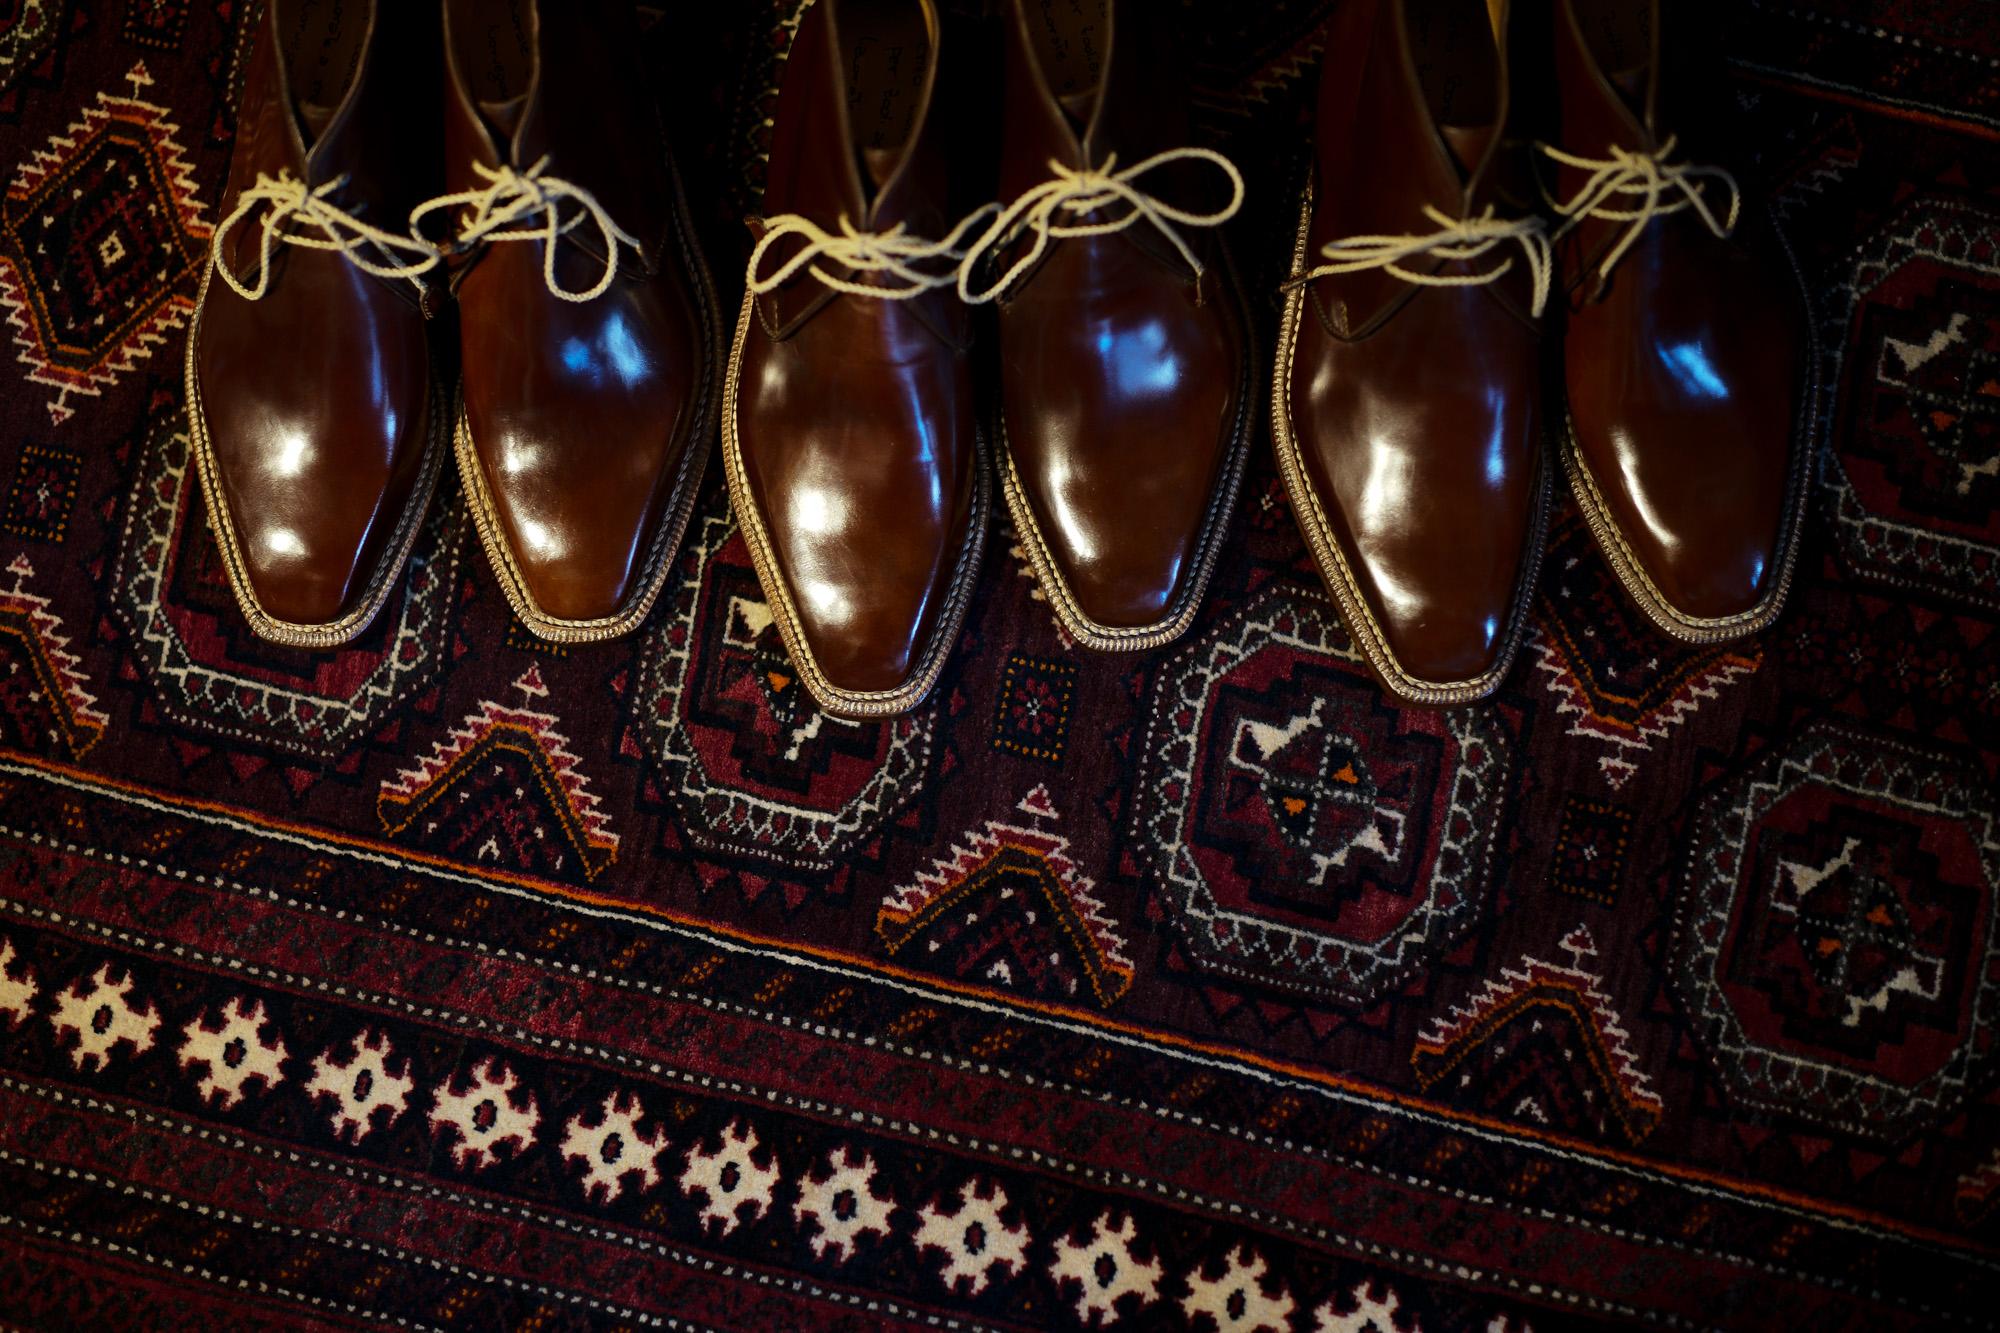 ENZO BONAFE(エンツォボナフェ) ART.3722 Chukka boots チャッカブーツ Horween Shell Cordovan Leather ホーウィン社 シェルコードバンレザー ノルベジェーゼ製法 チャッカブーツ コードバンブーツ No.4(#4)  made in italy (イタリア製) 2019 春夏新作 【Special Model】 enzobonafe 愛知 名古屋 altoediritto アルトエデリット